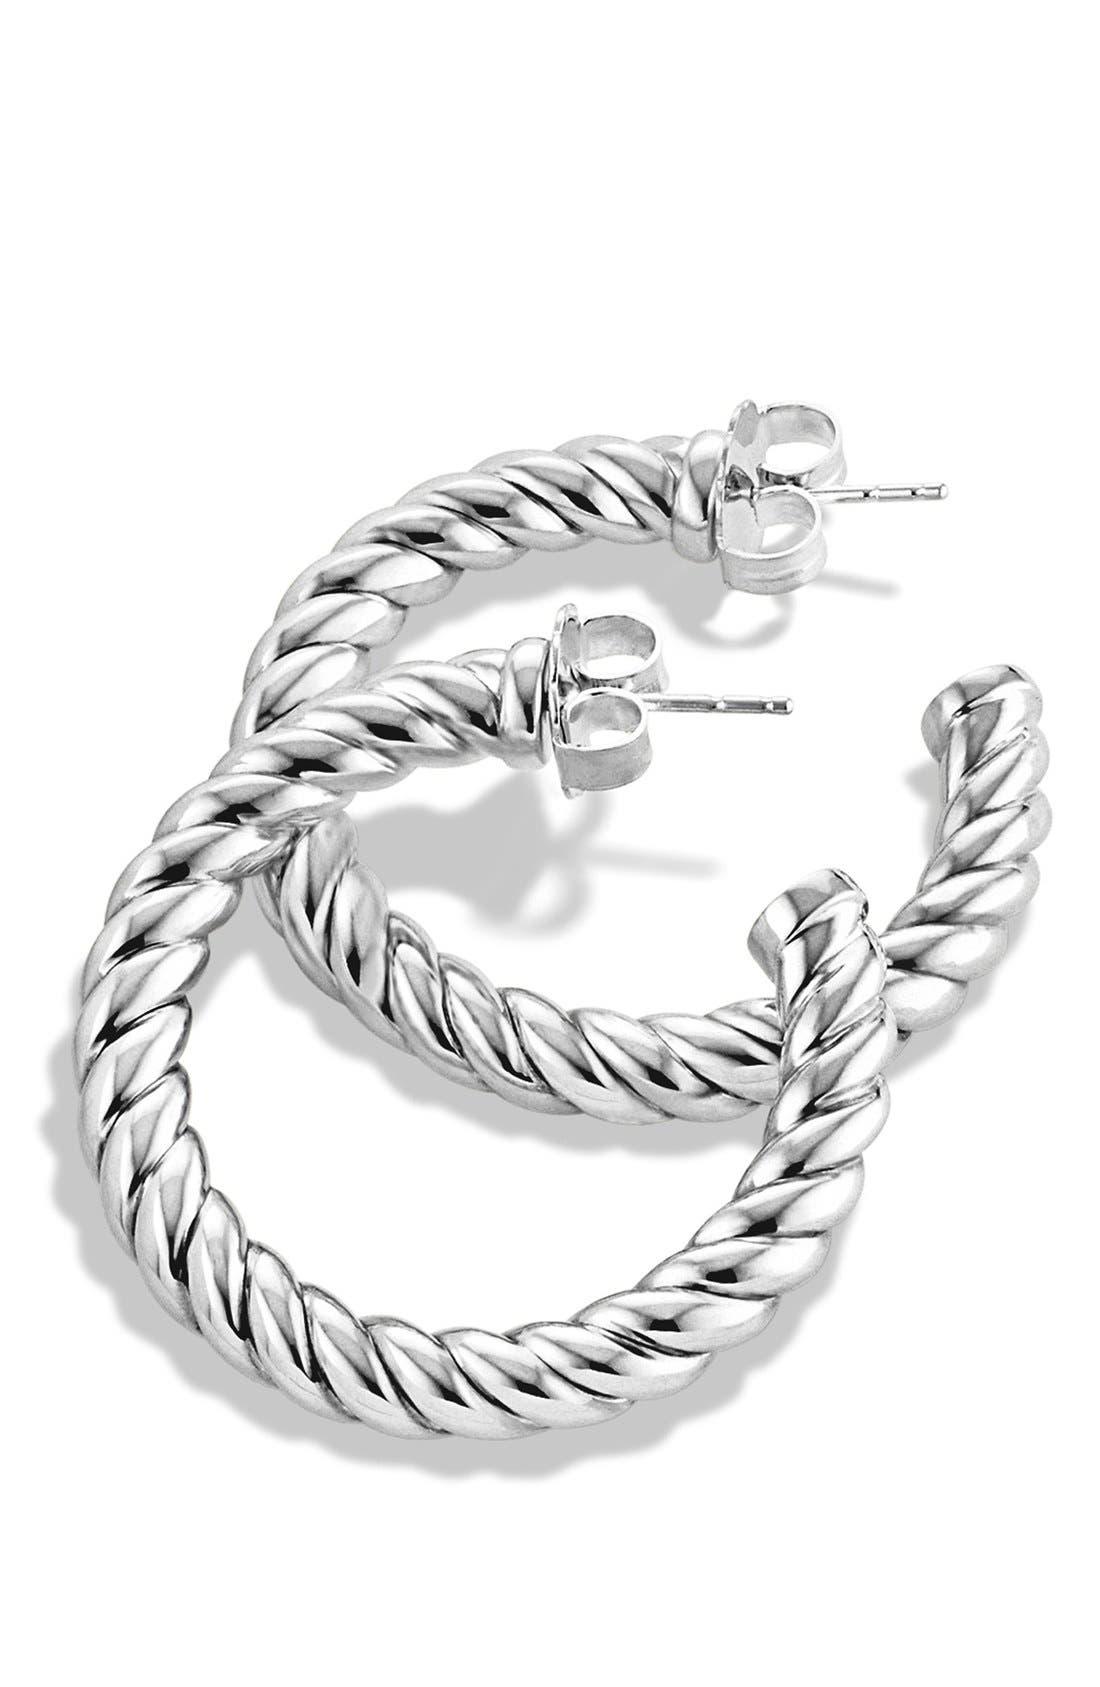 'Cable Classics' Hoop Earrings,                             Alternate thumbnail 2, color,                             Silver